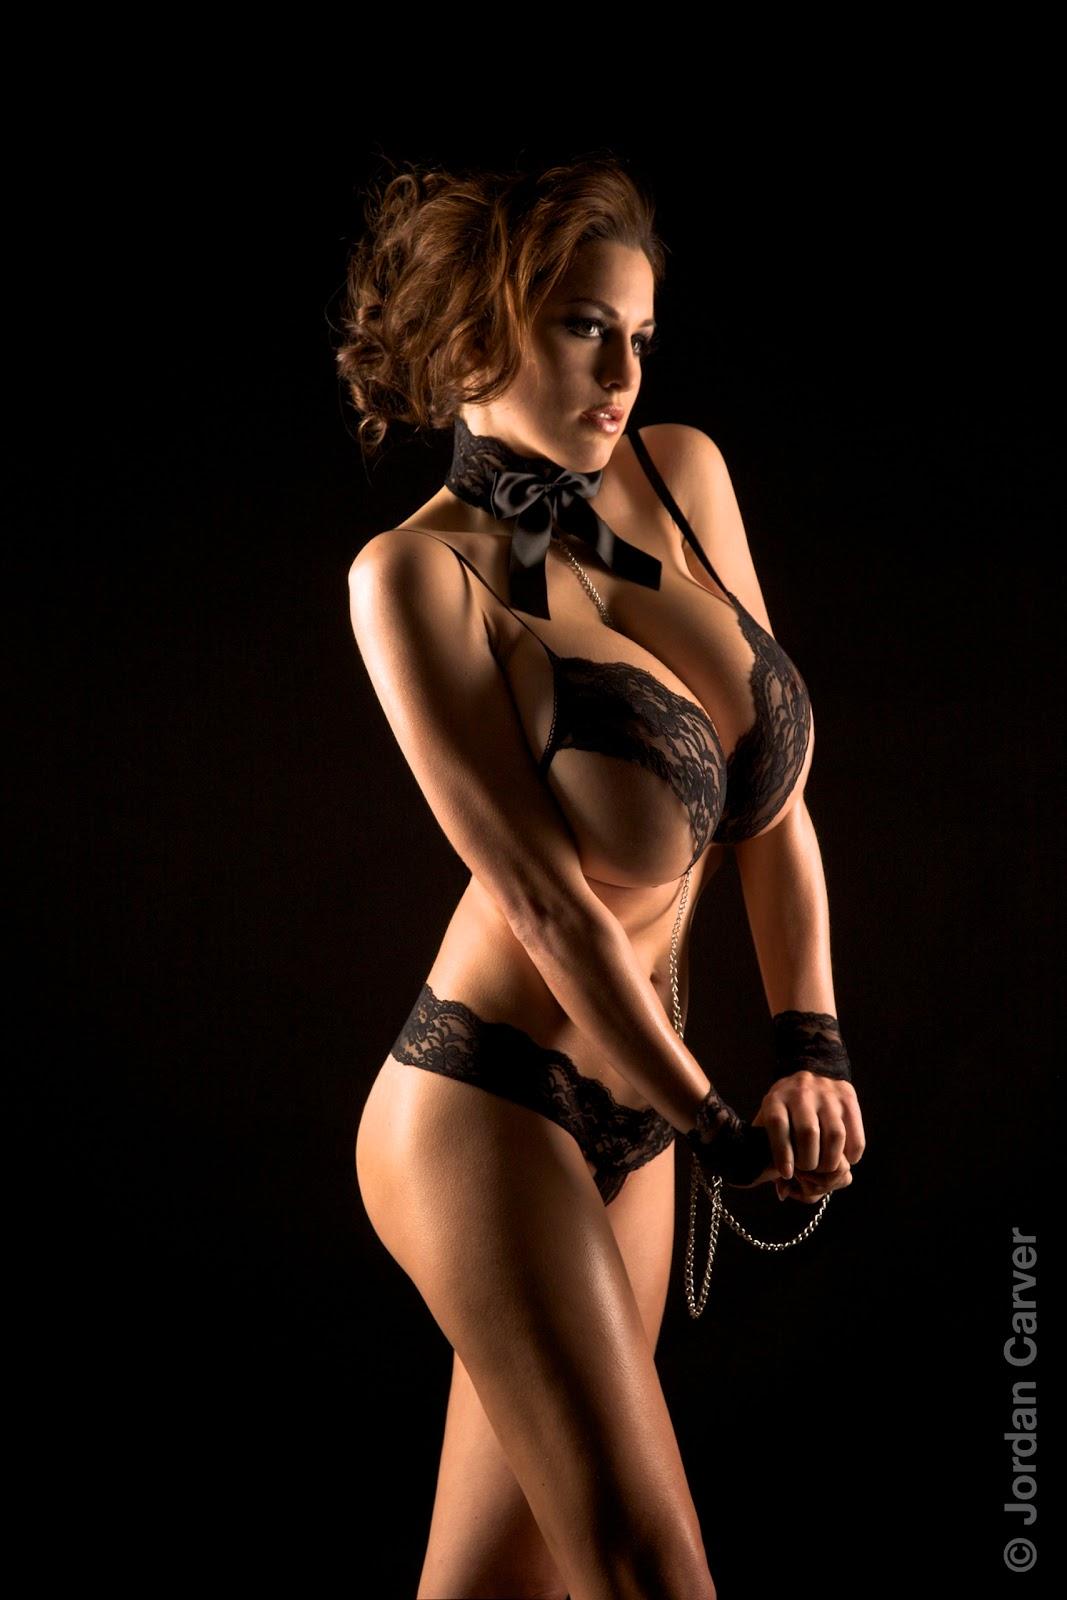 Hot Chicks: Jordan Carver...mega tits.